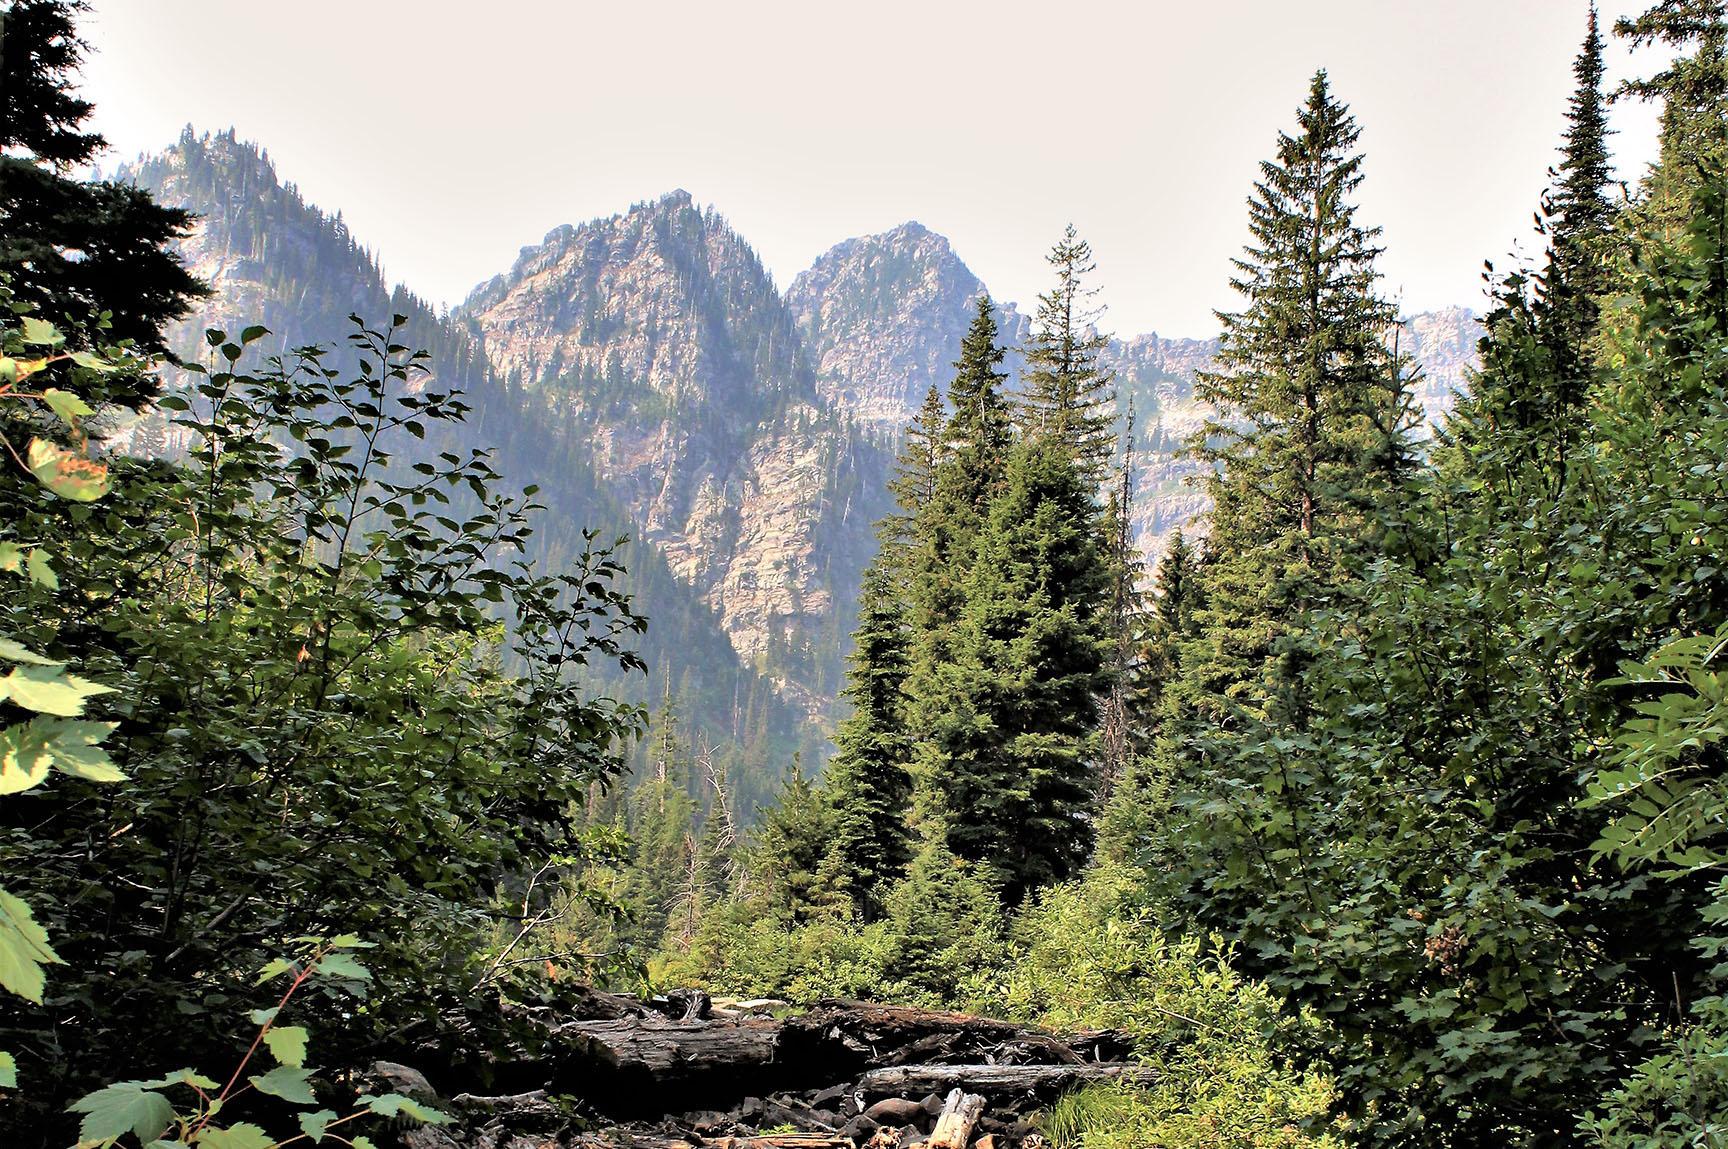 Lower Geiger Lake Glacier Insurance libby troy eureka montana